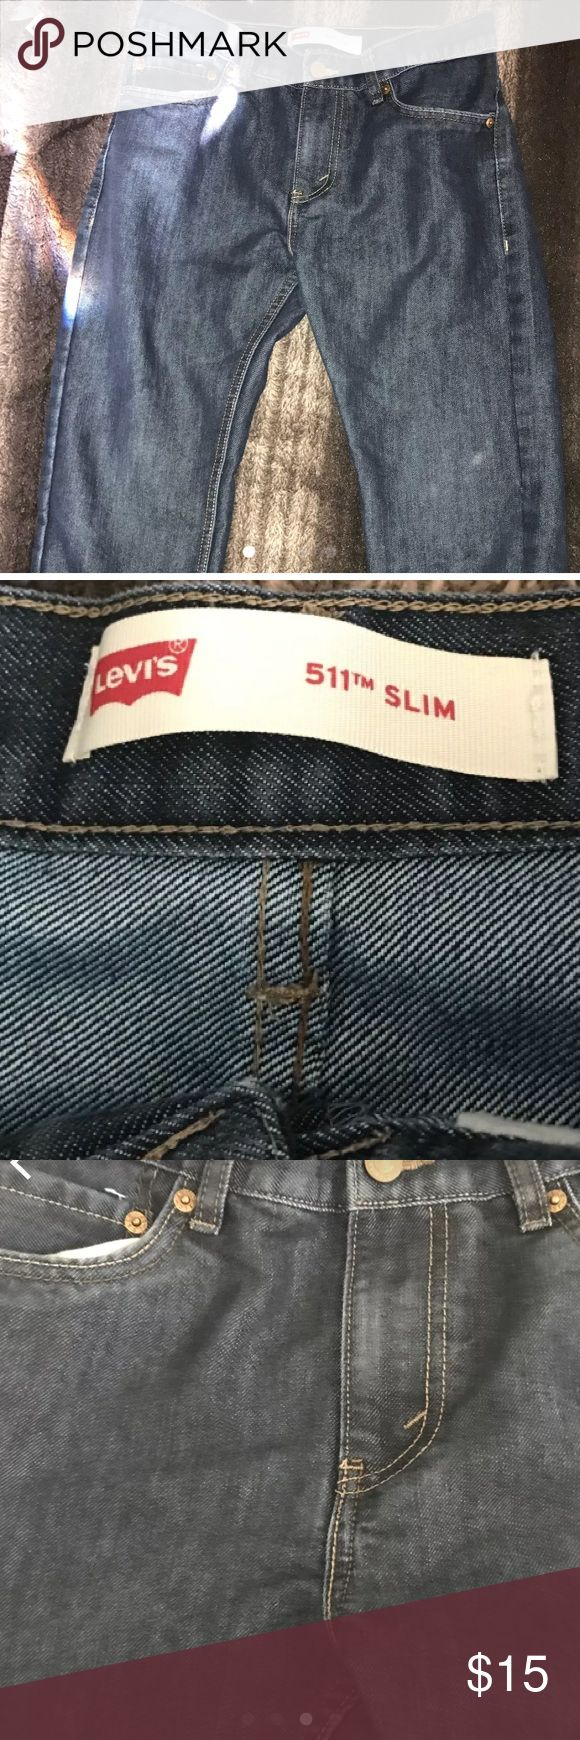 "Levi's boys slim 511 👖 pants. Levi's Slim 511 18 reg w29""- L 29"" Gently used. Levi's Bottoms Jeans"